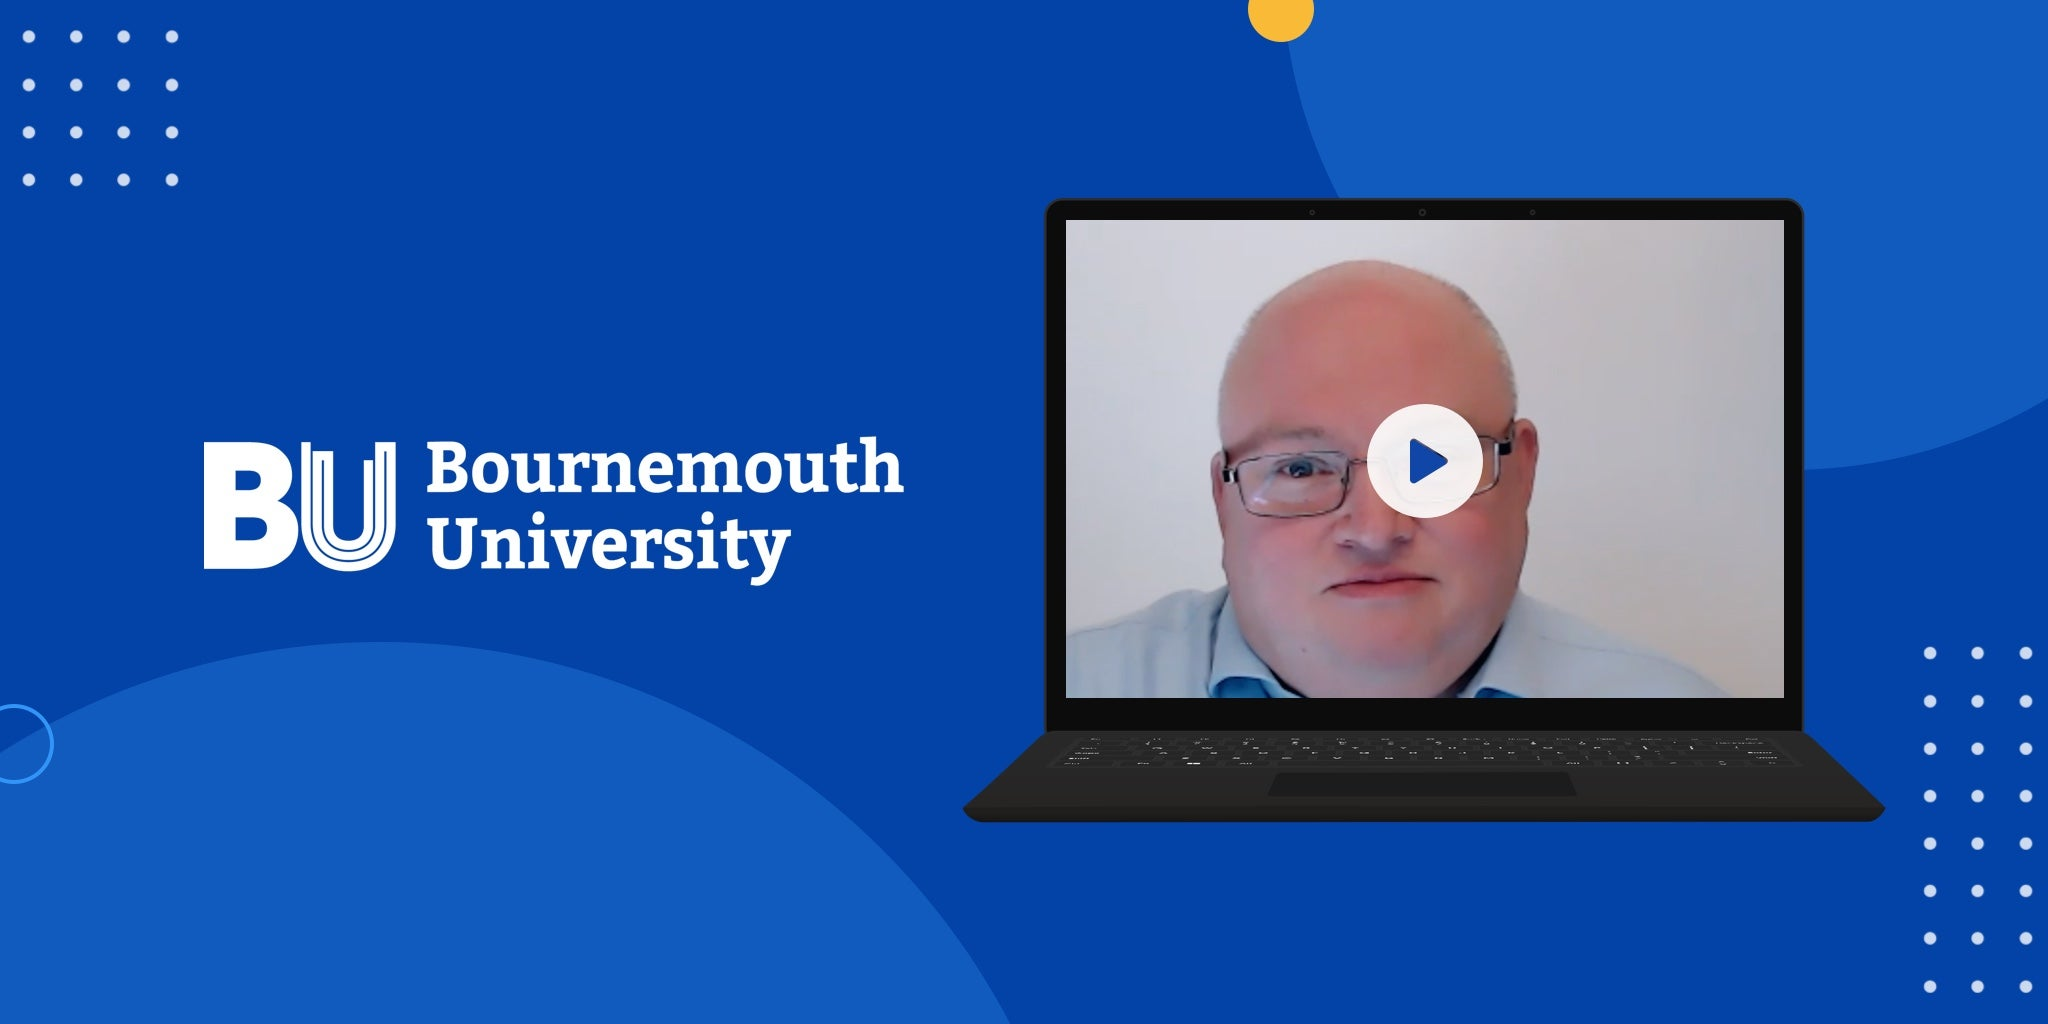 Through the Crisis: Nexthink Customer Stories (Bournemouth University)